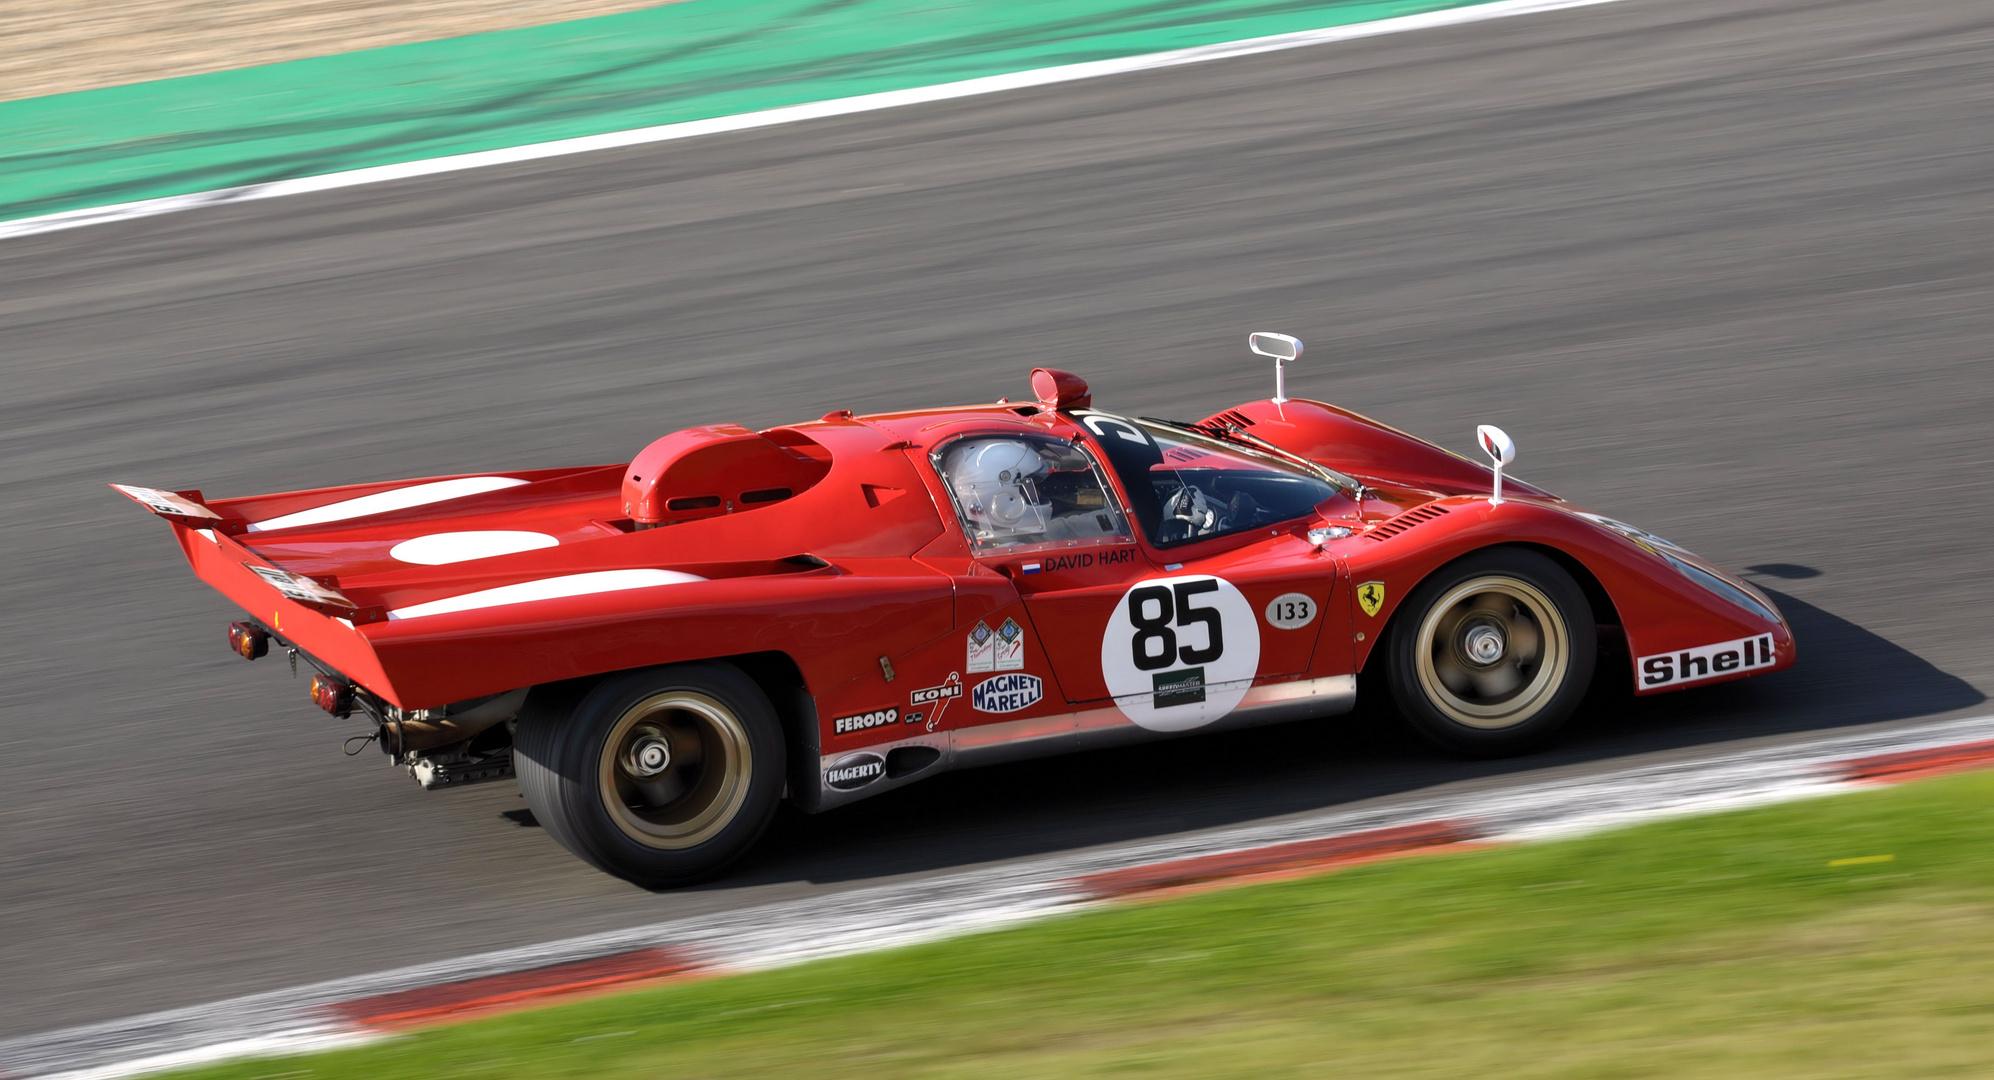 Ferrari allesisterlaubt Wochen #6